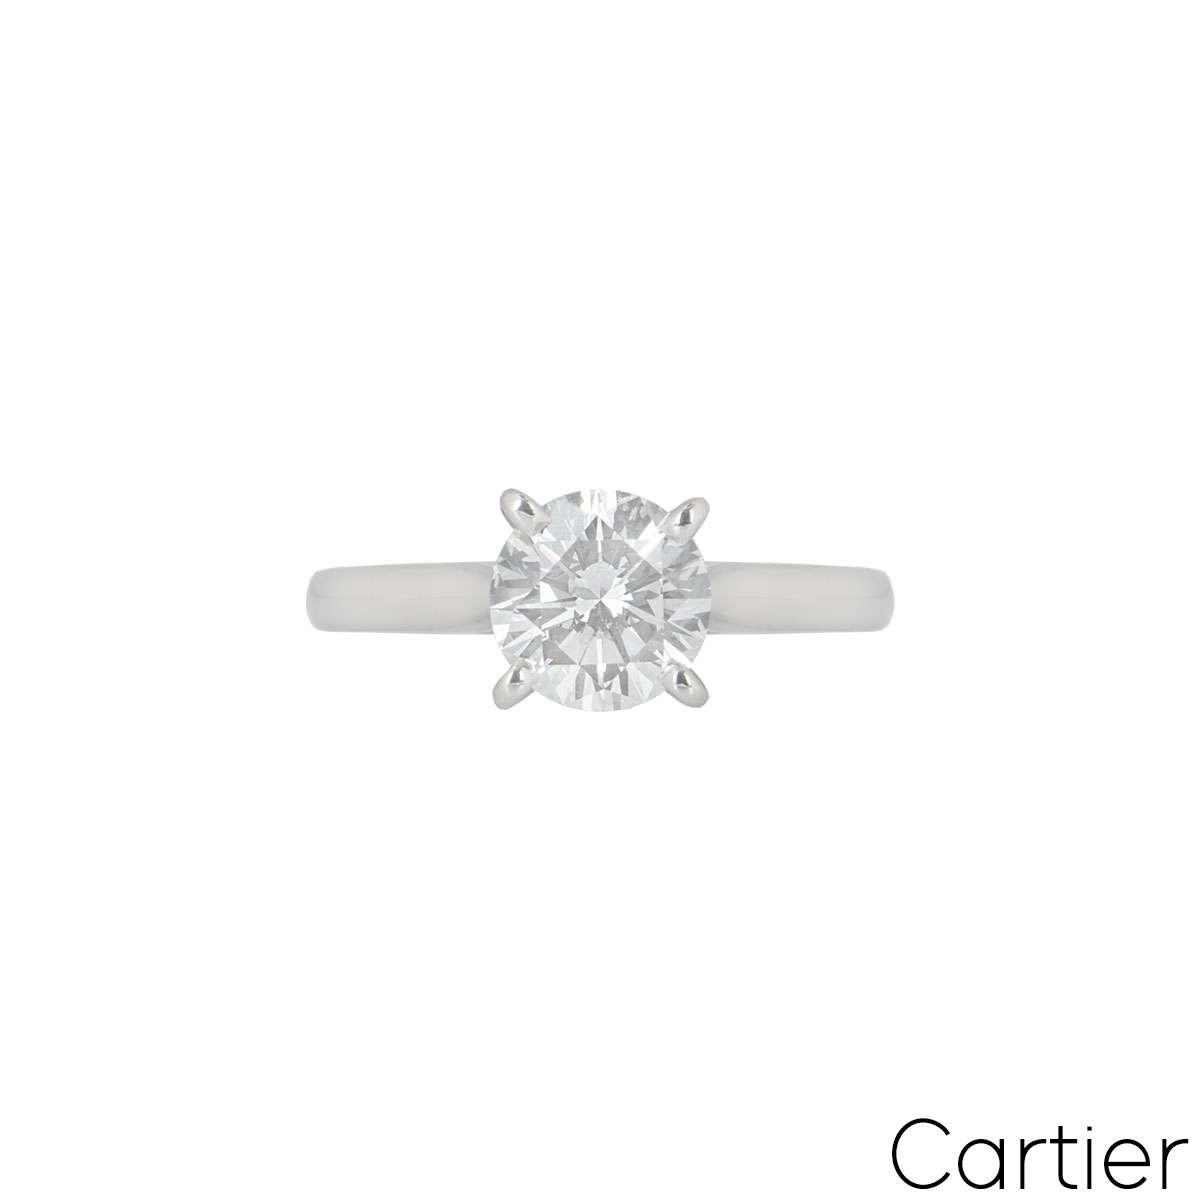 Cartier Platinum Diamond 1895 Solitaire Ring 1.54ct G/VS2